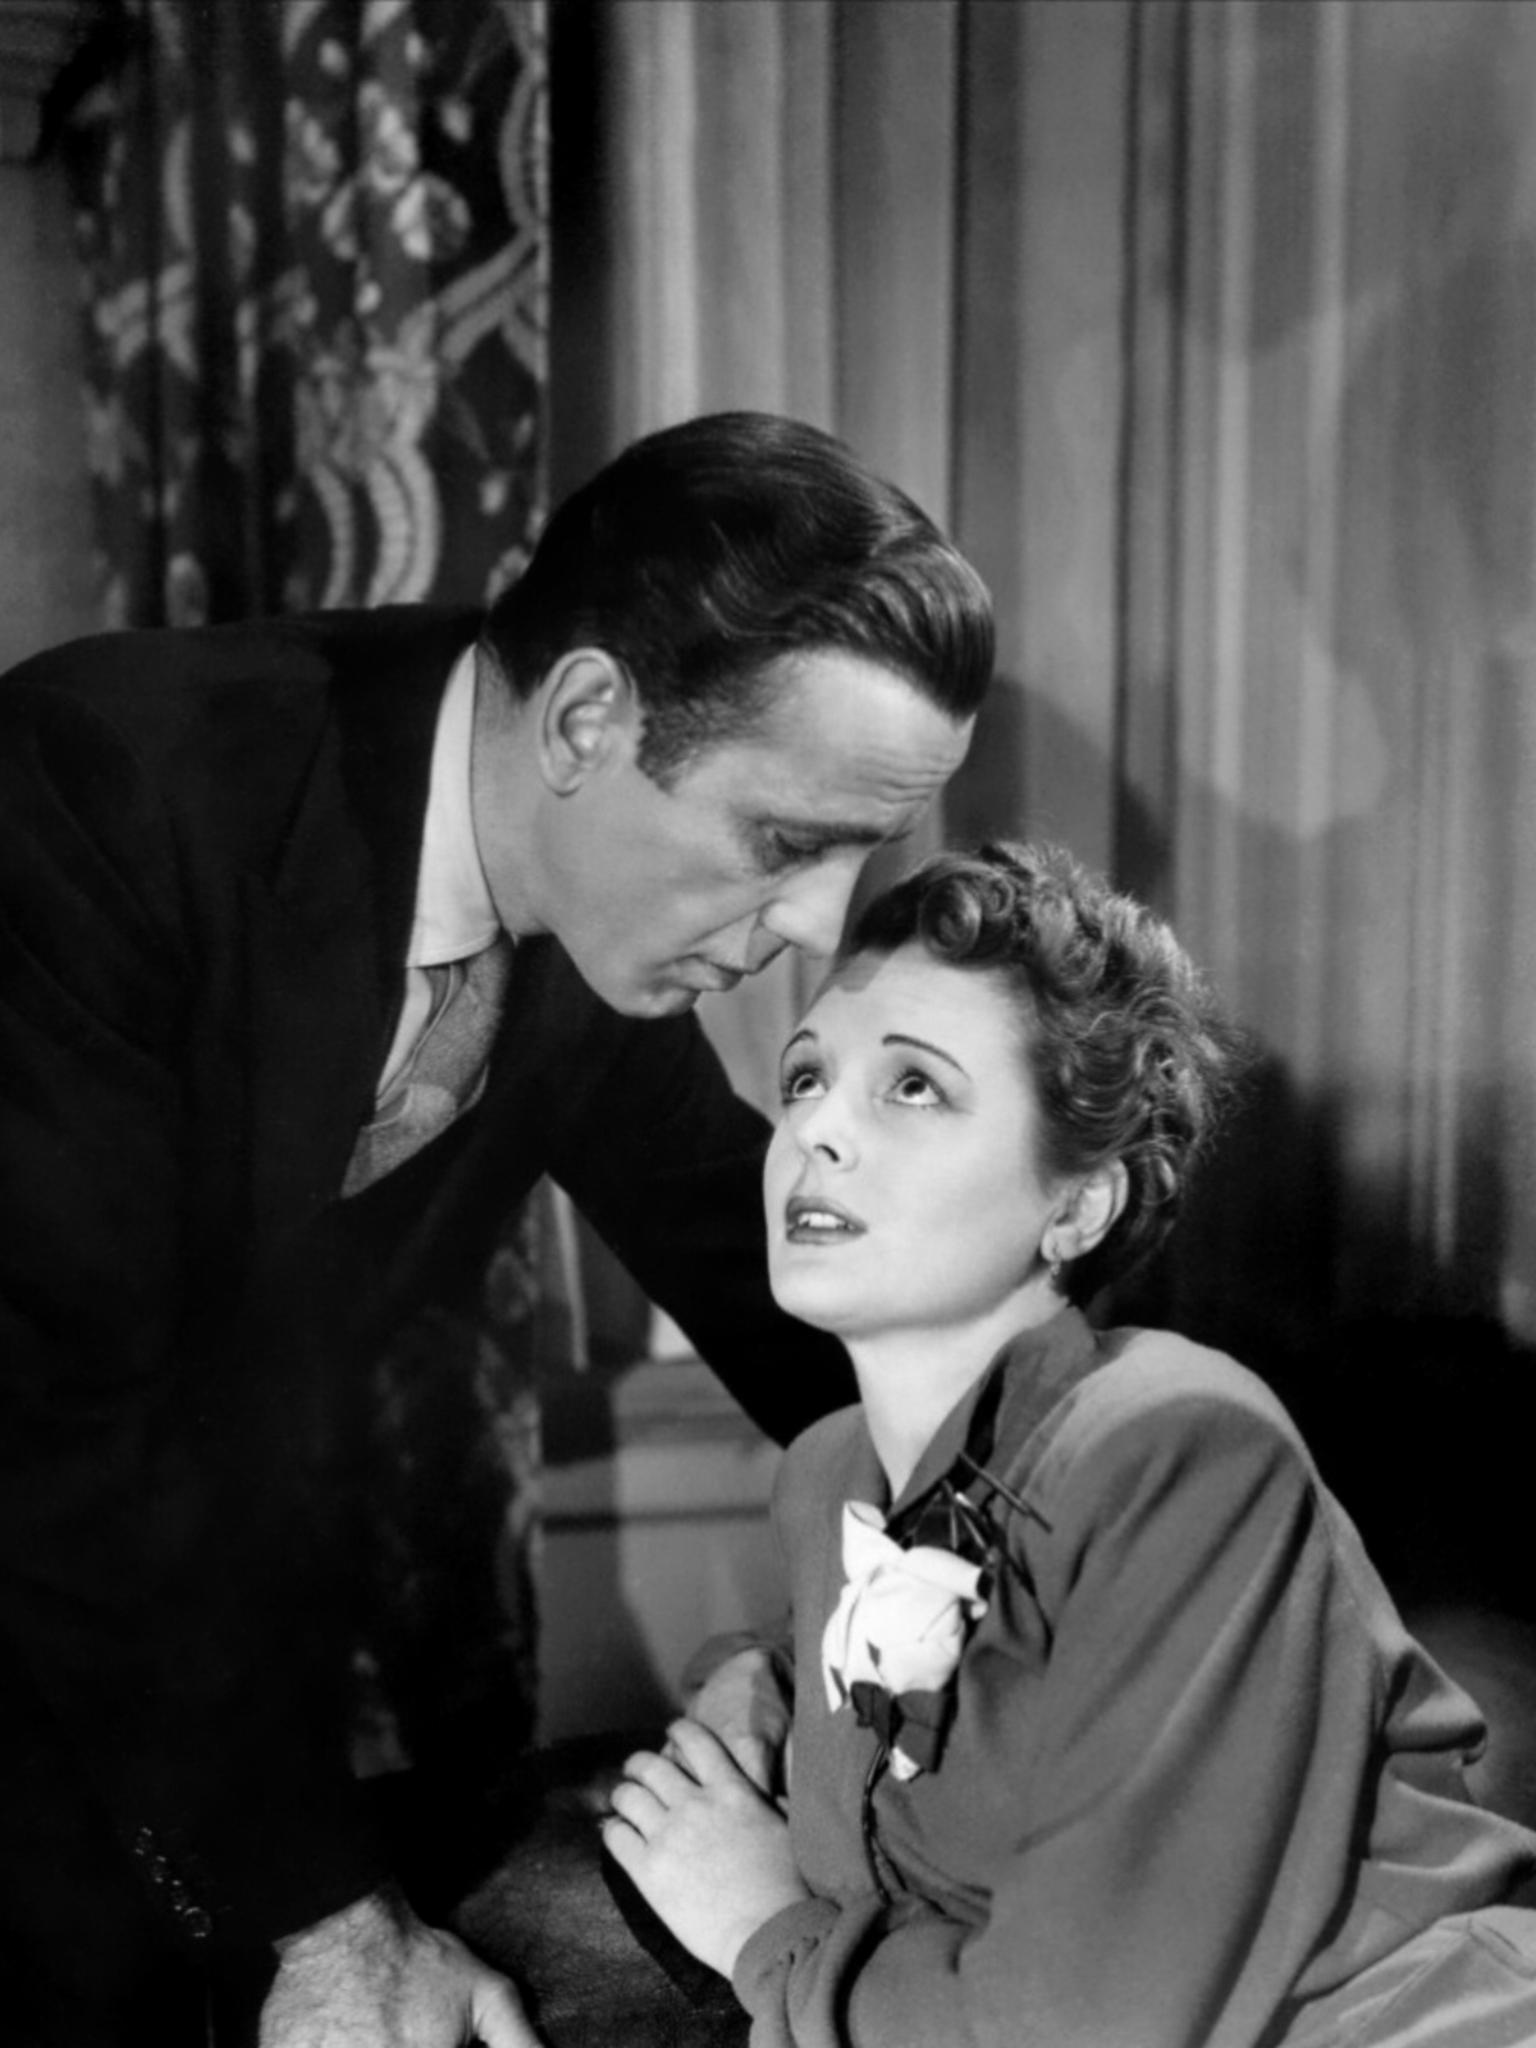 Humphrey Bogart And Mary Astor The Maltese Falcon 1941 Mary Astor Humphrey Bogart Bogart